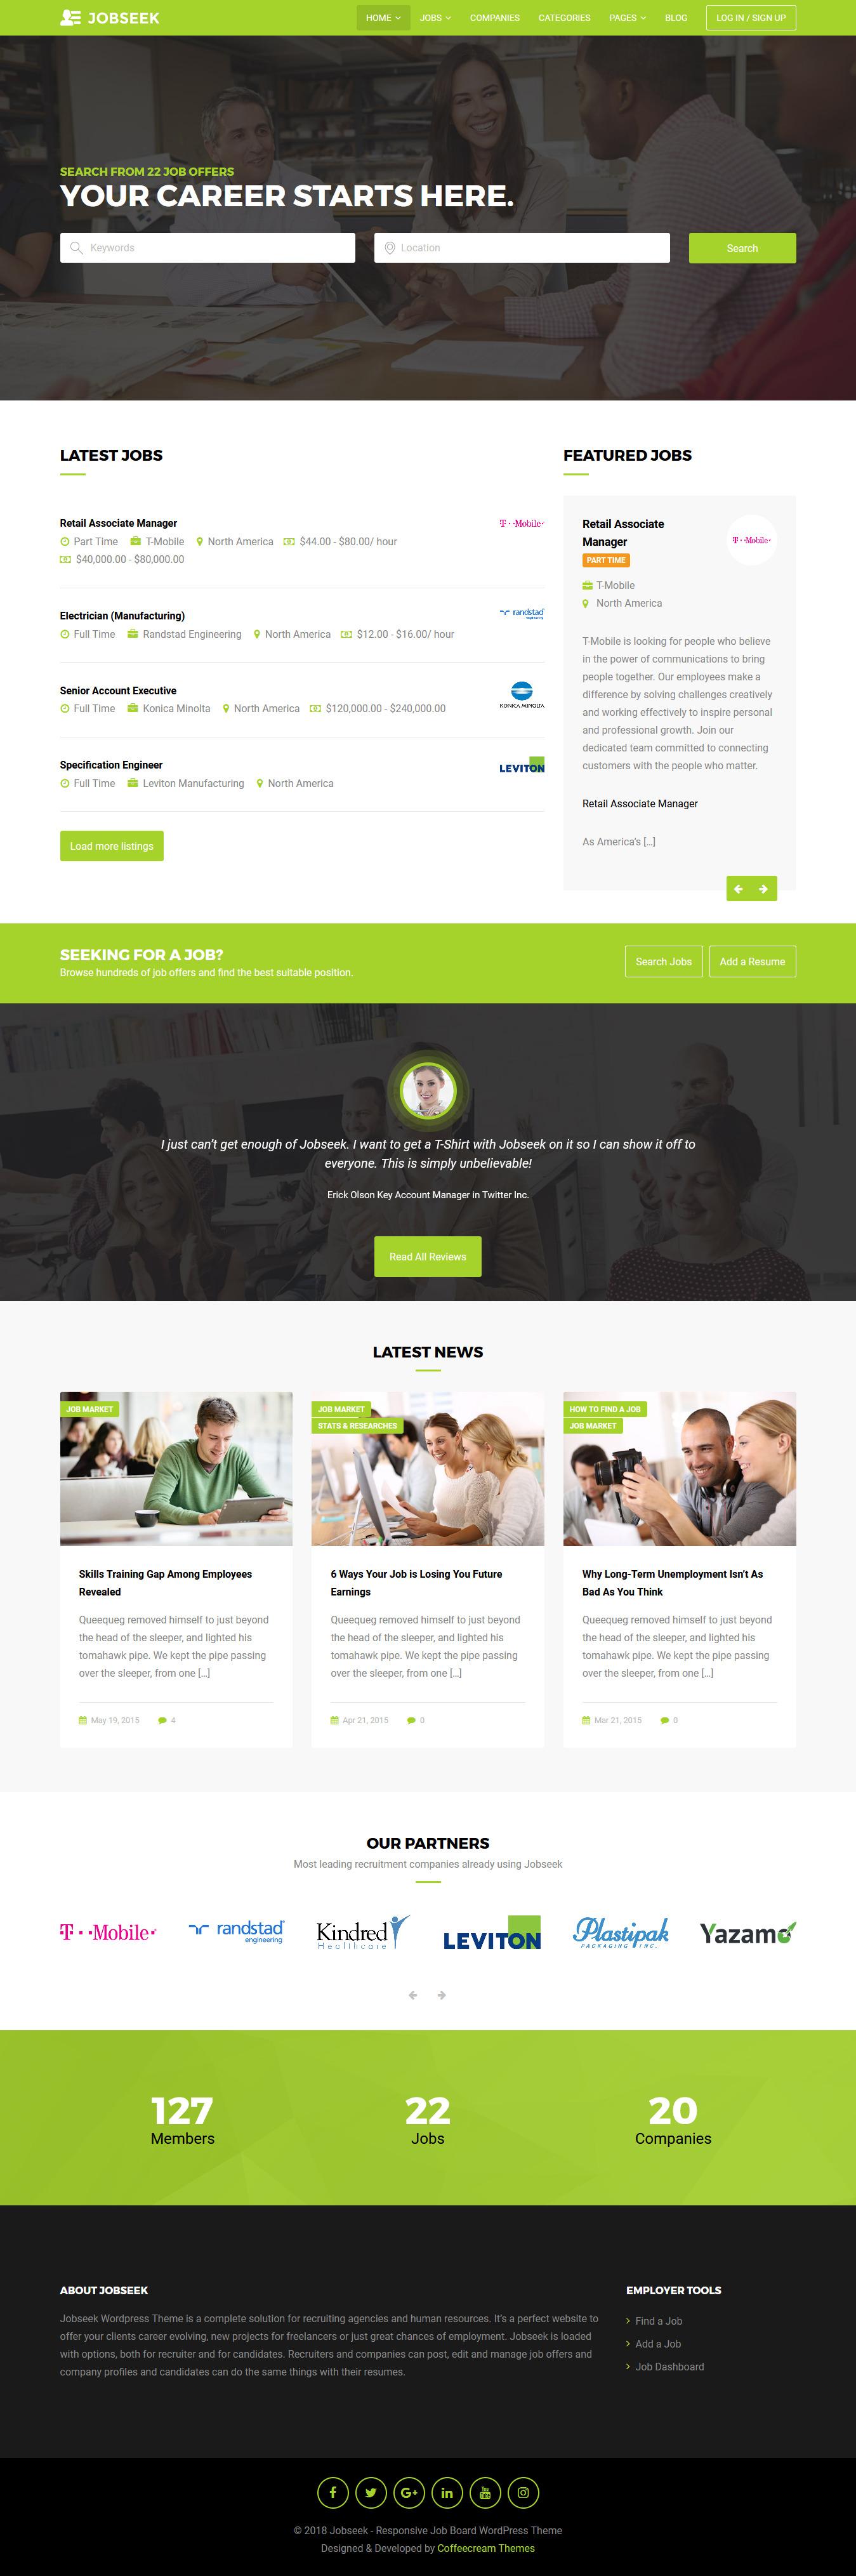 Jobseek - Best Premium Job Board WordPress Theme